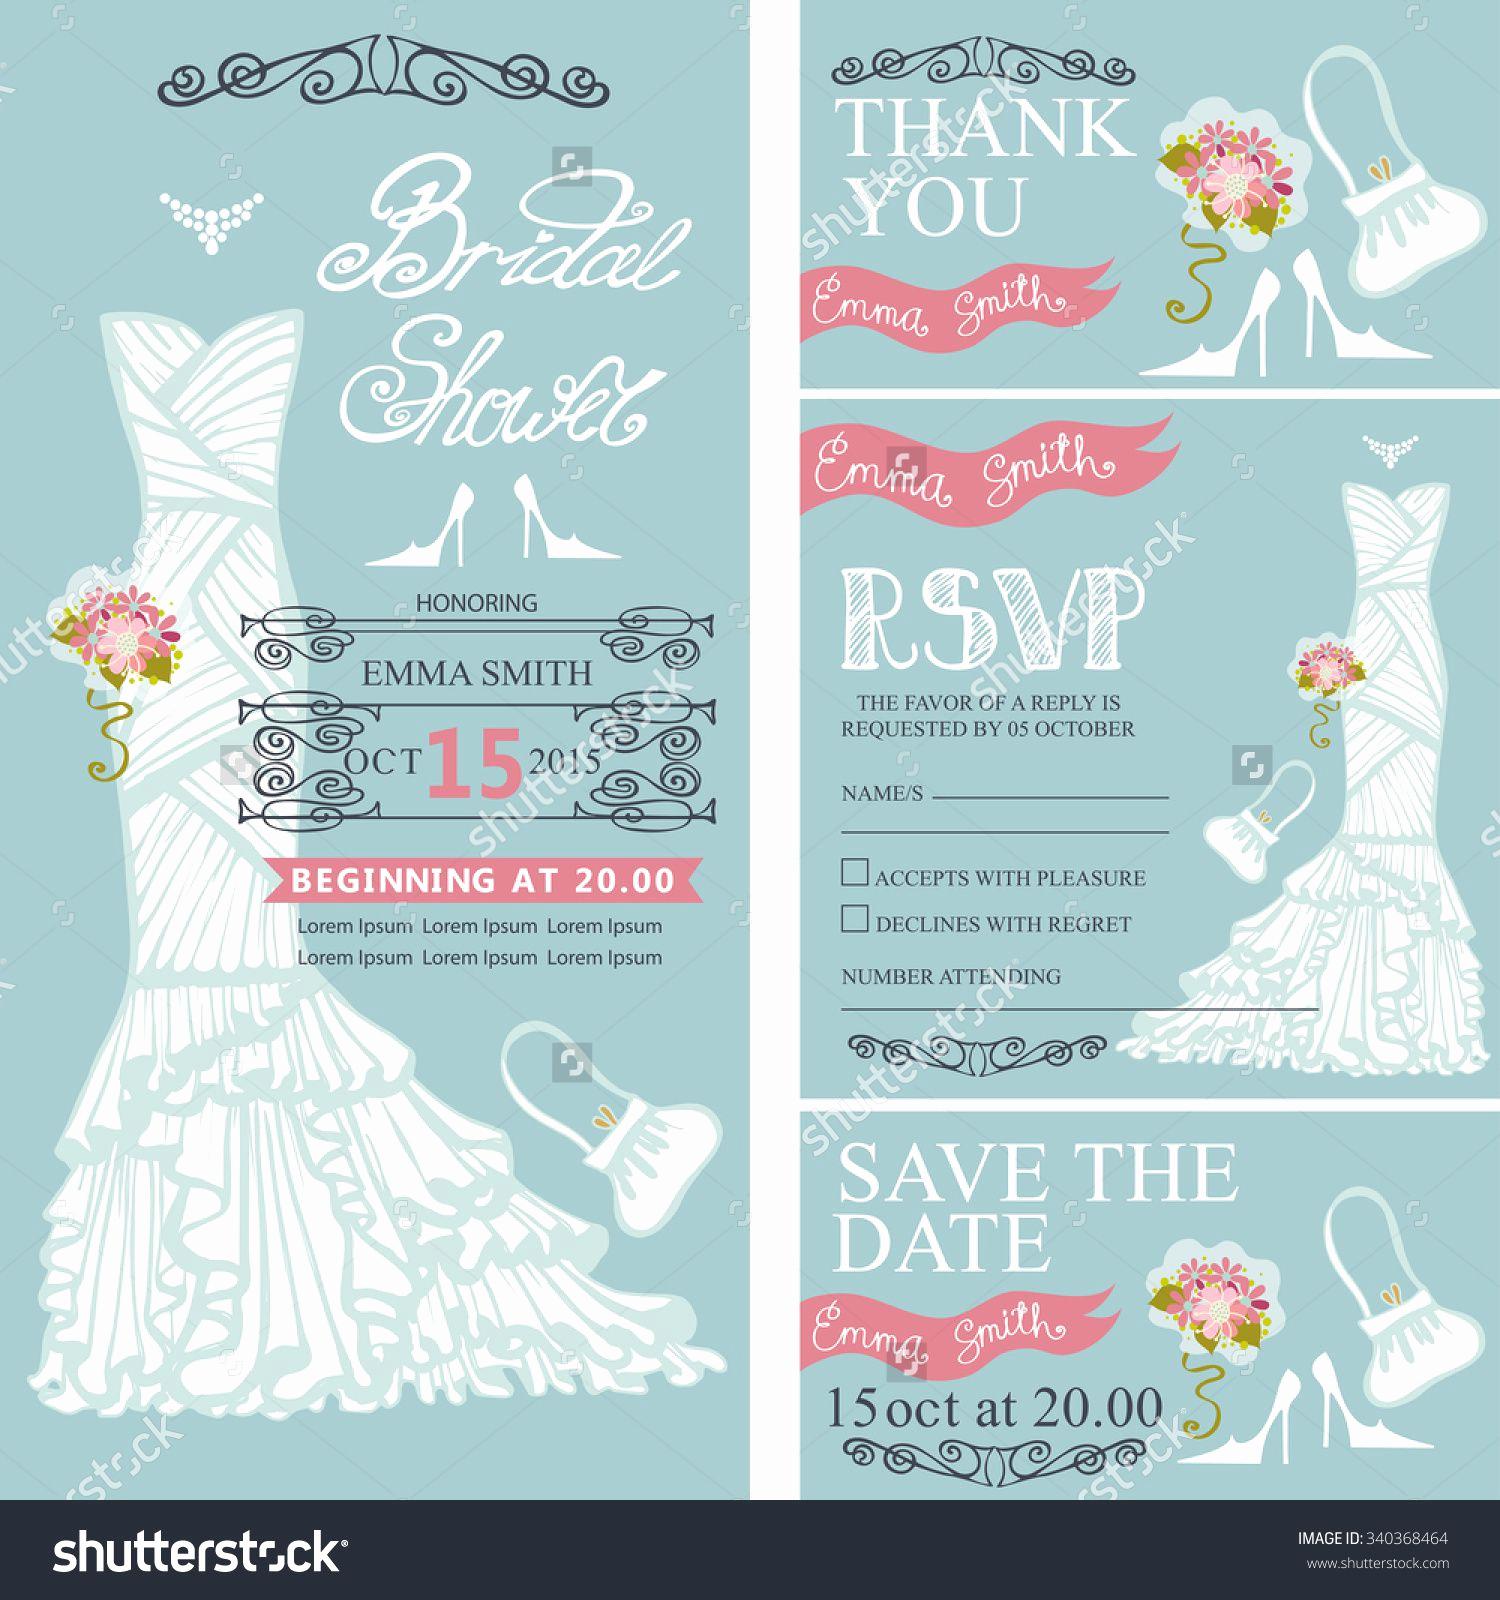 Wedding Shower Invitation Template Luxury Bridal Shower Invitation Verbiage Bridal Shower